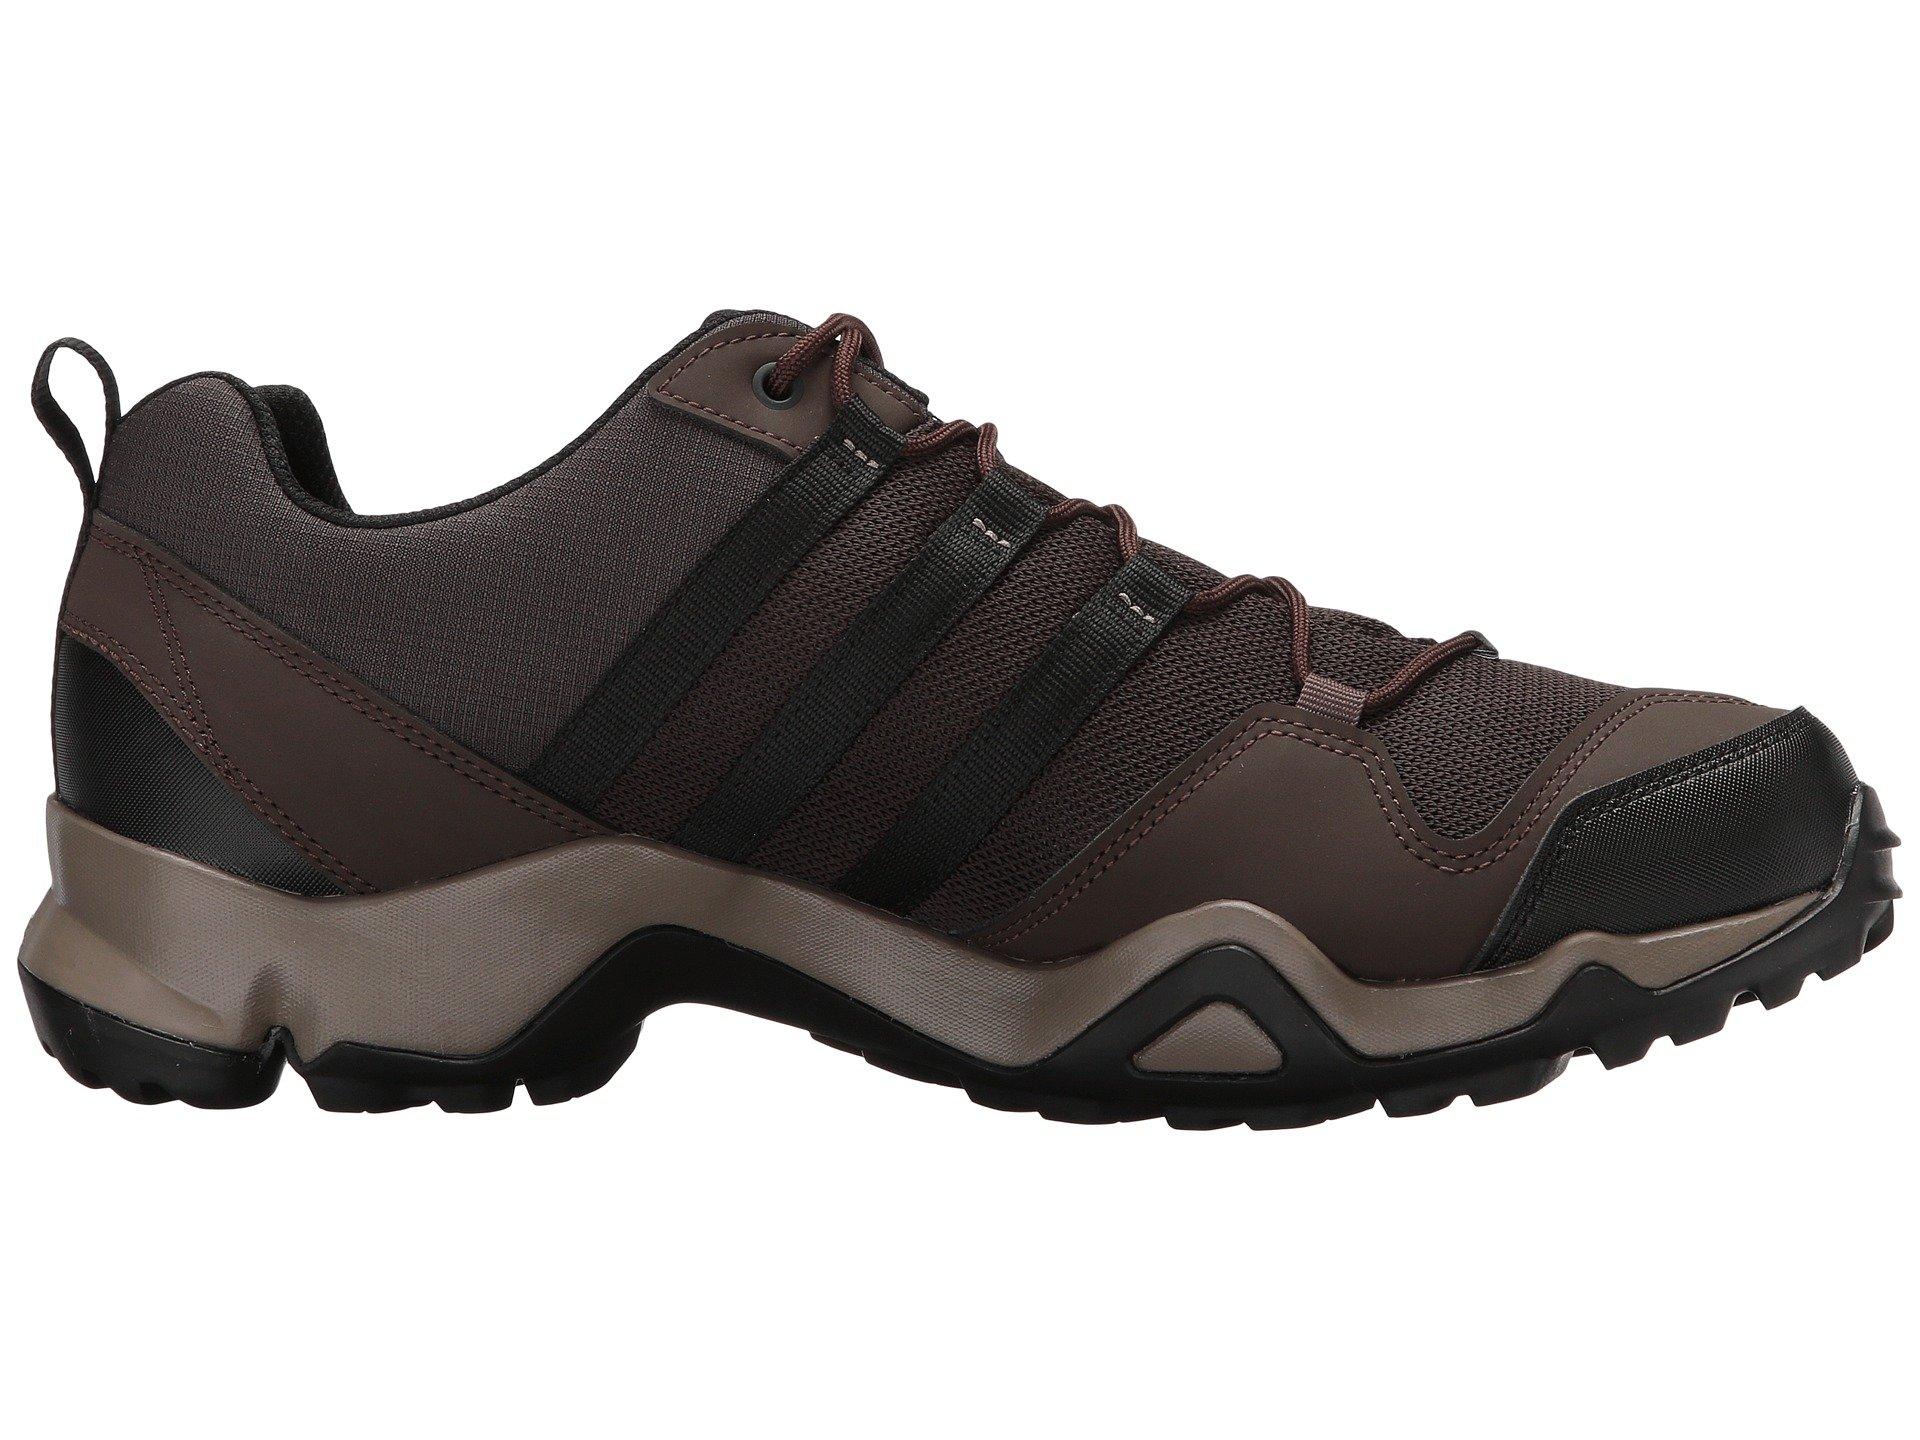 night black Brown Ax2r Terrex Adidas Outdoor Black aCAwAgq